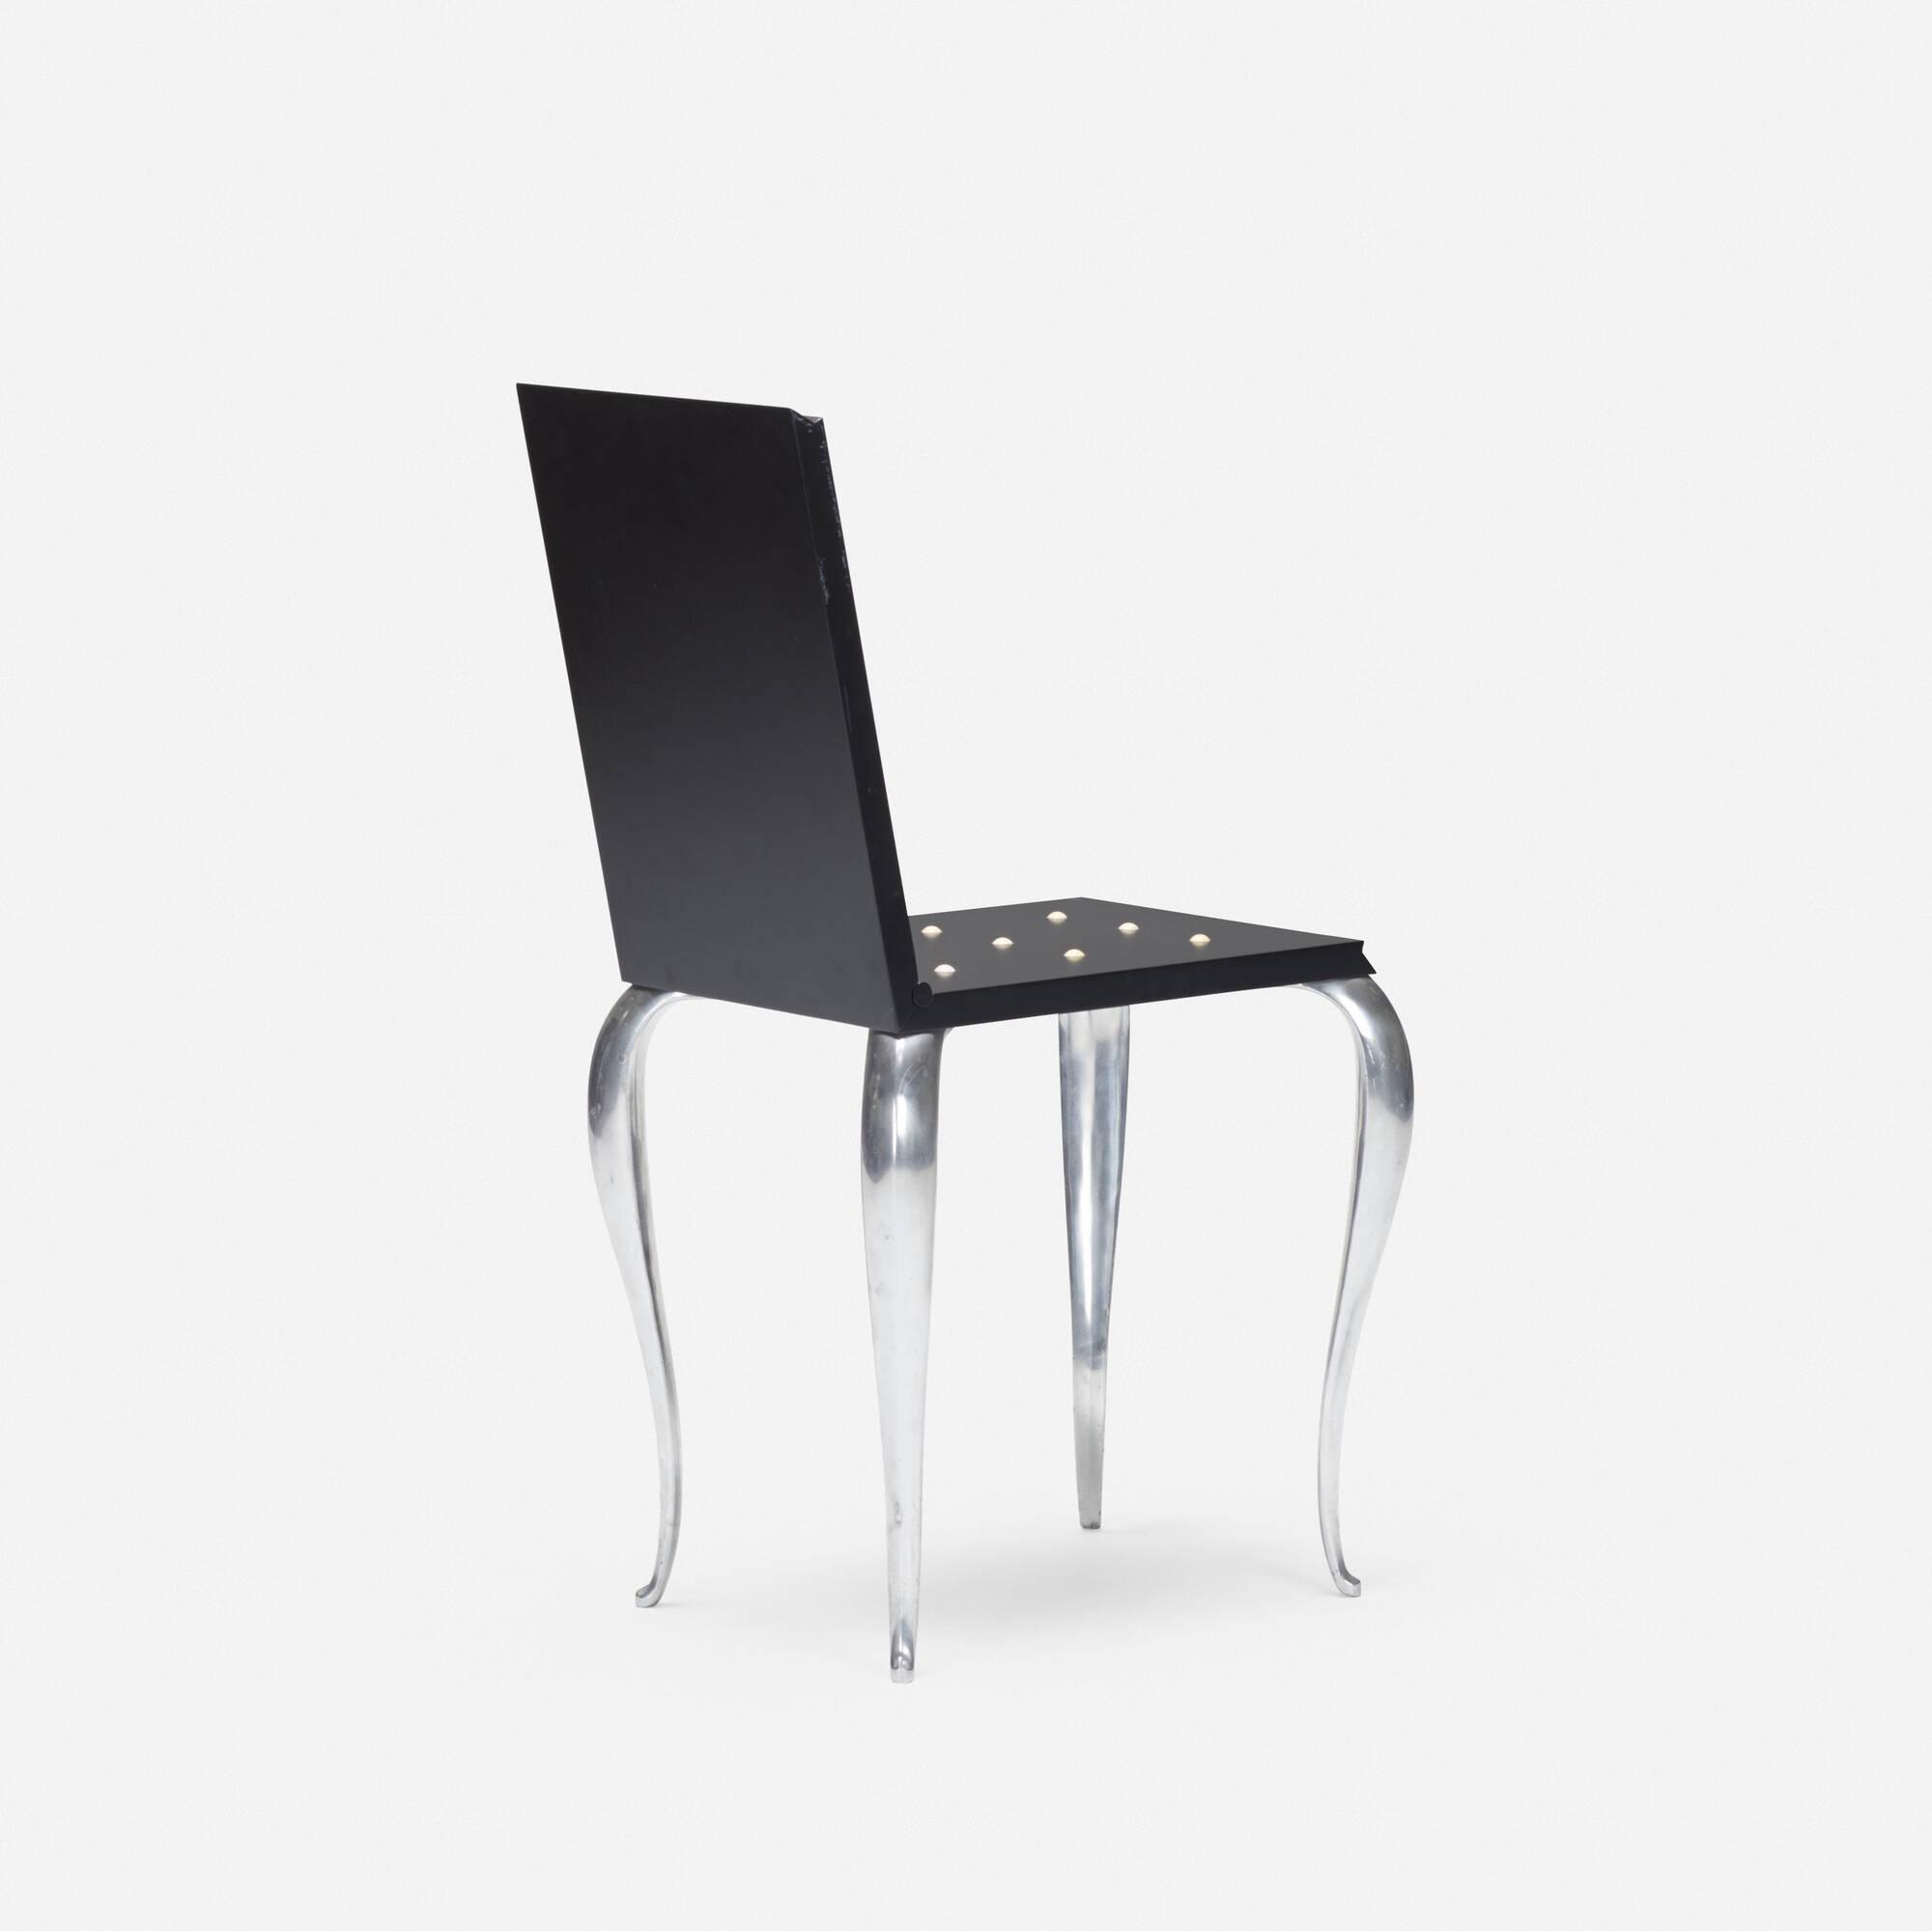 174 philippe starck lola mundo chair living contemporary 14